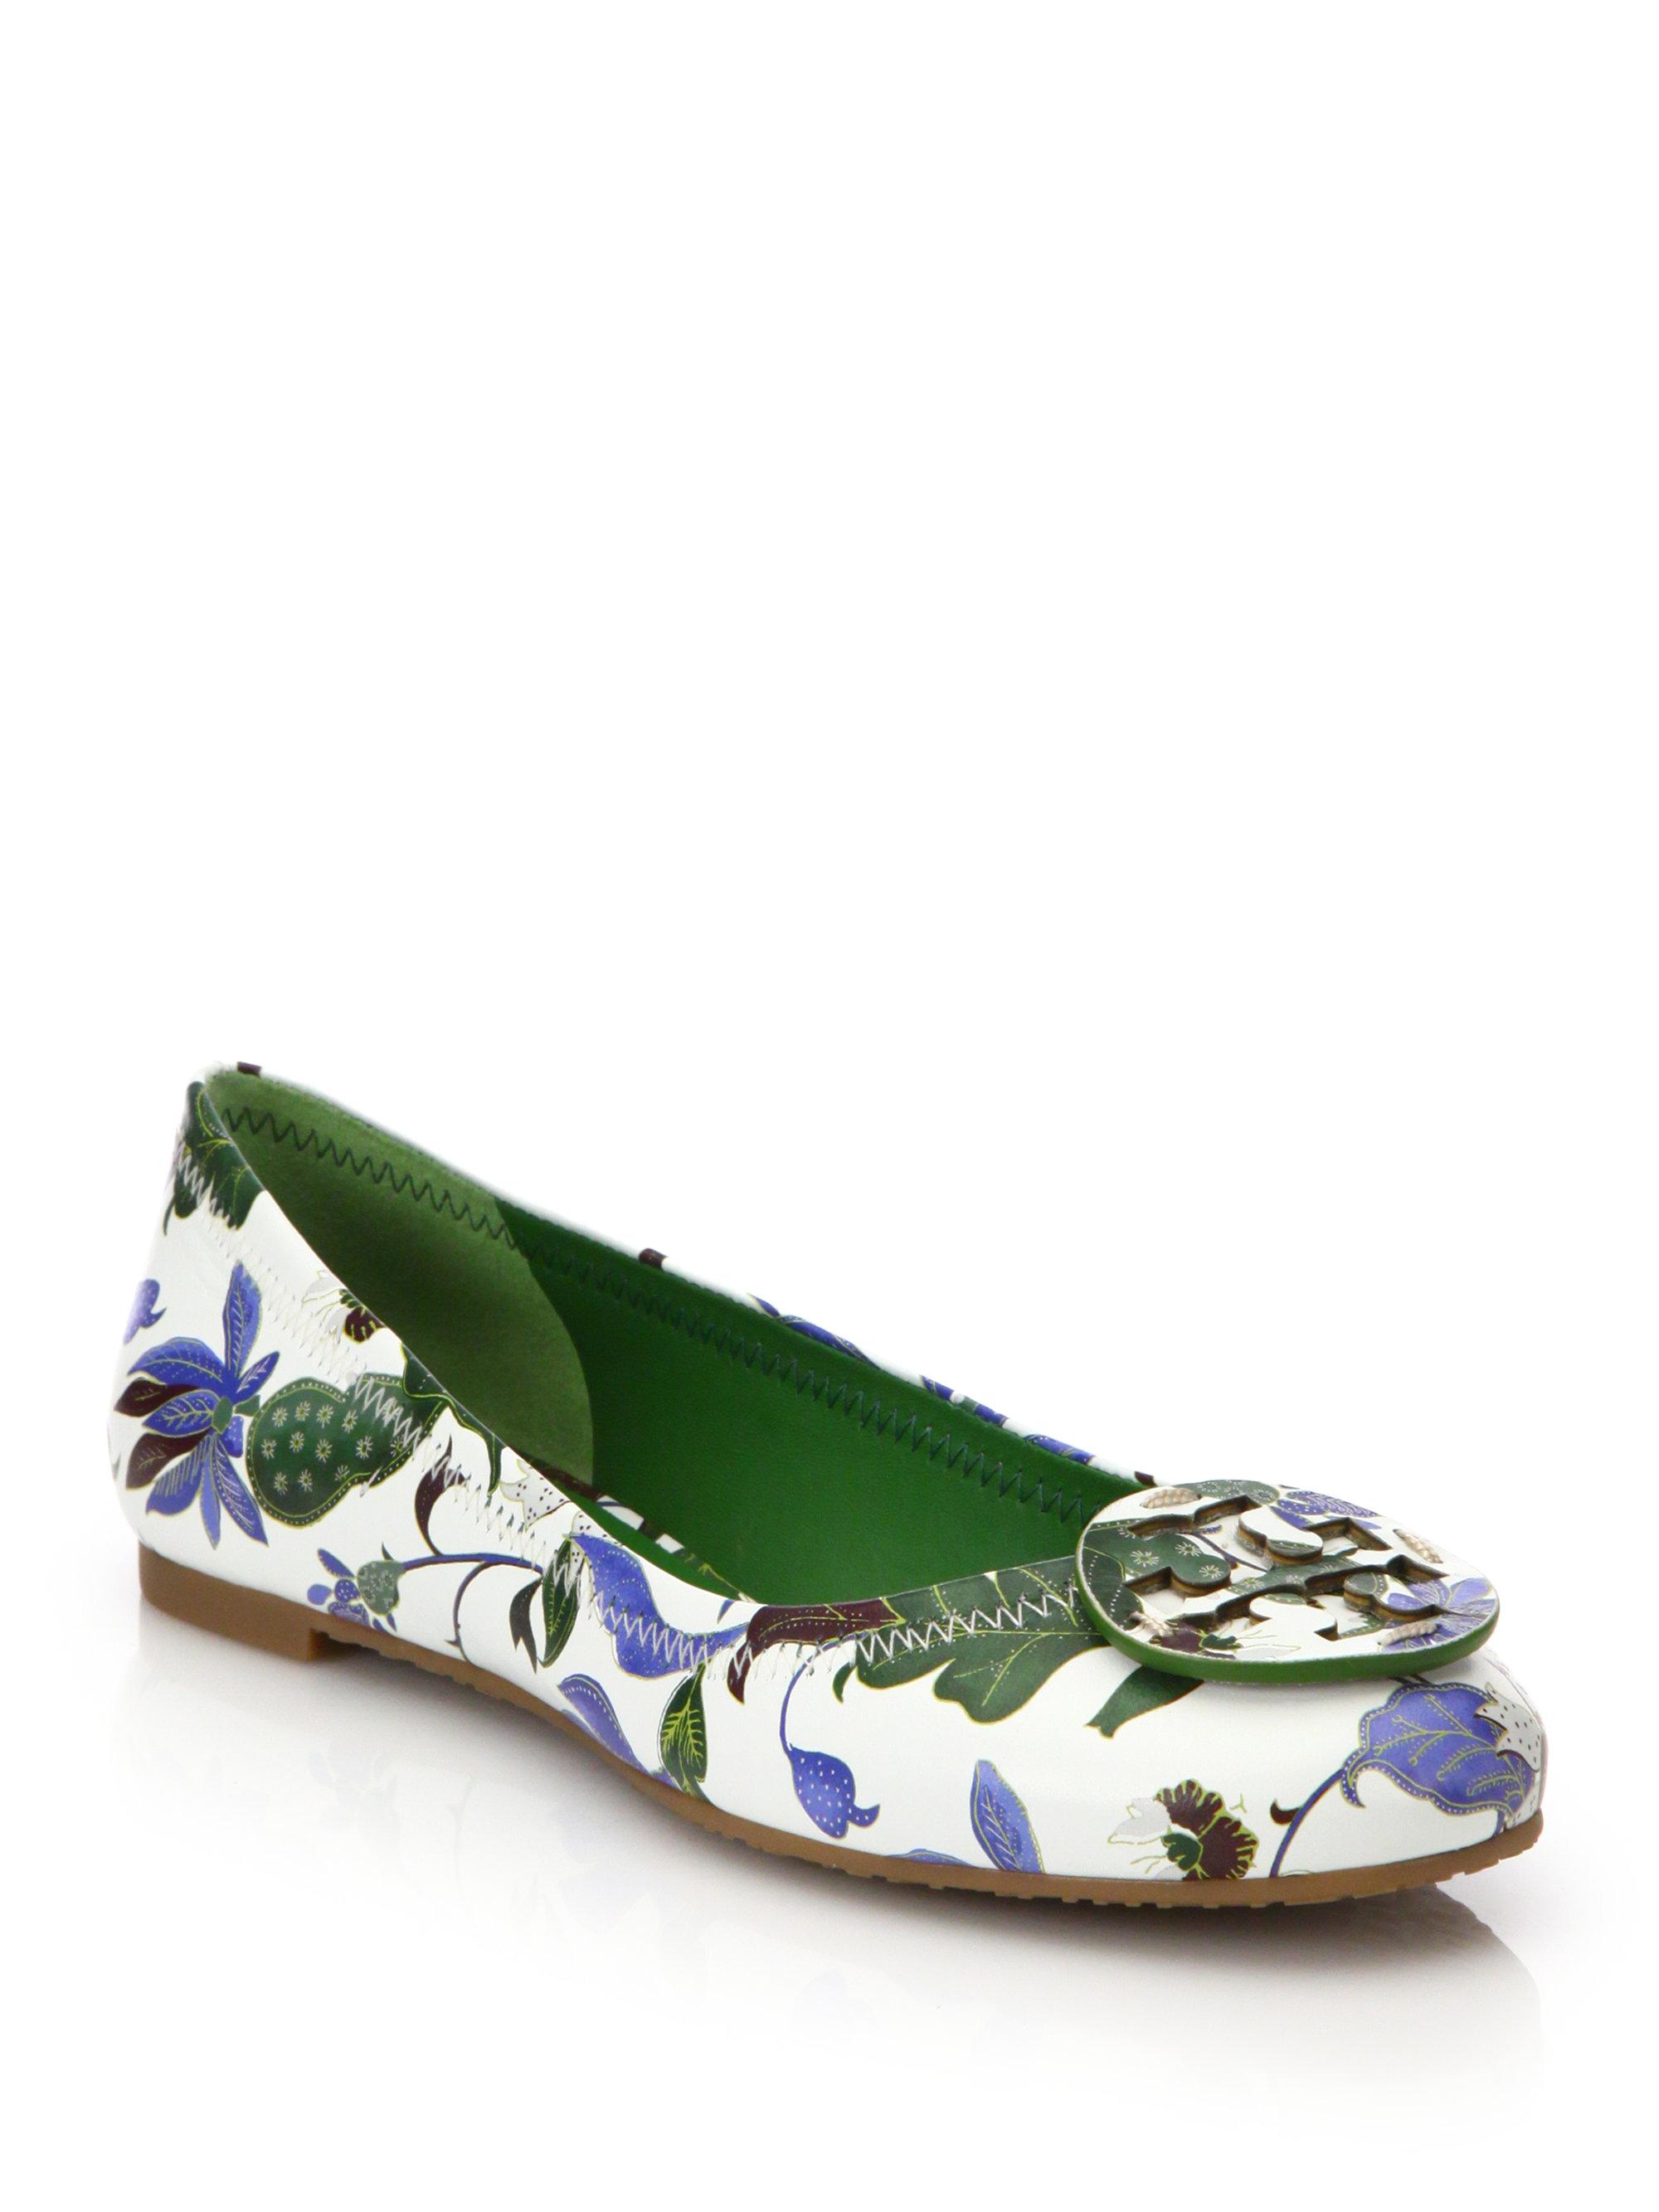 a038a7d8c2ce8 Lyst - Tory Burch Reva Floral Leather Ballet Flats